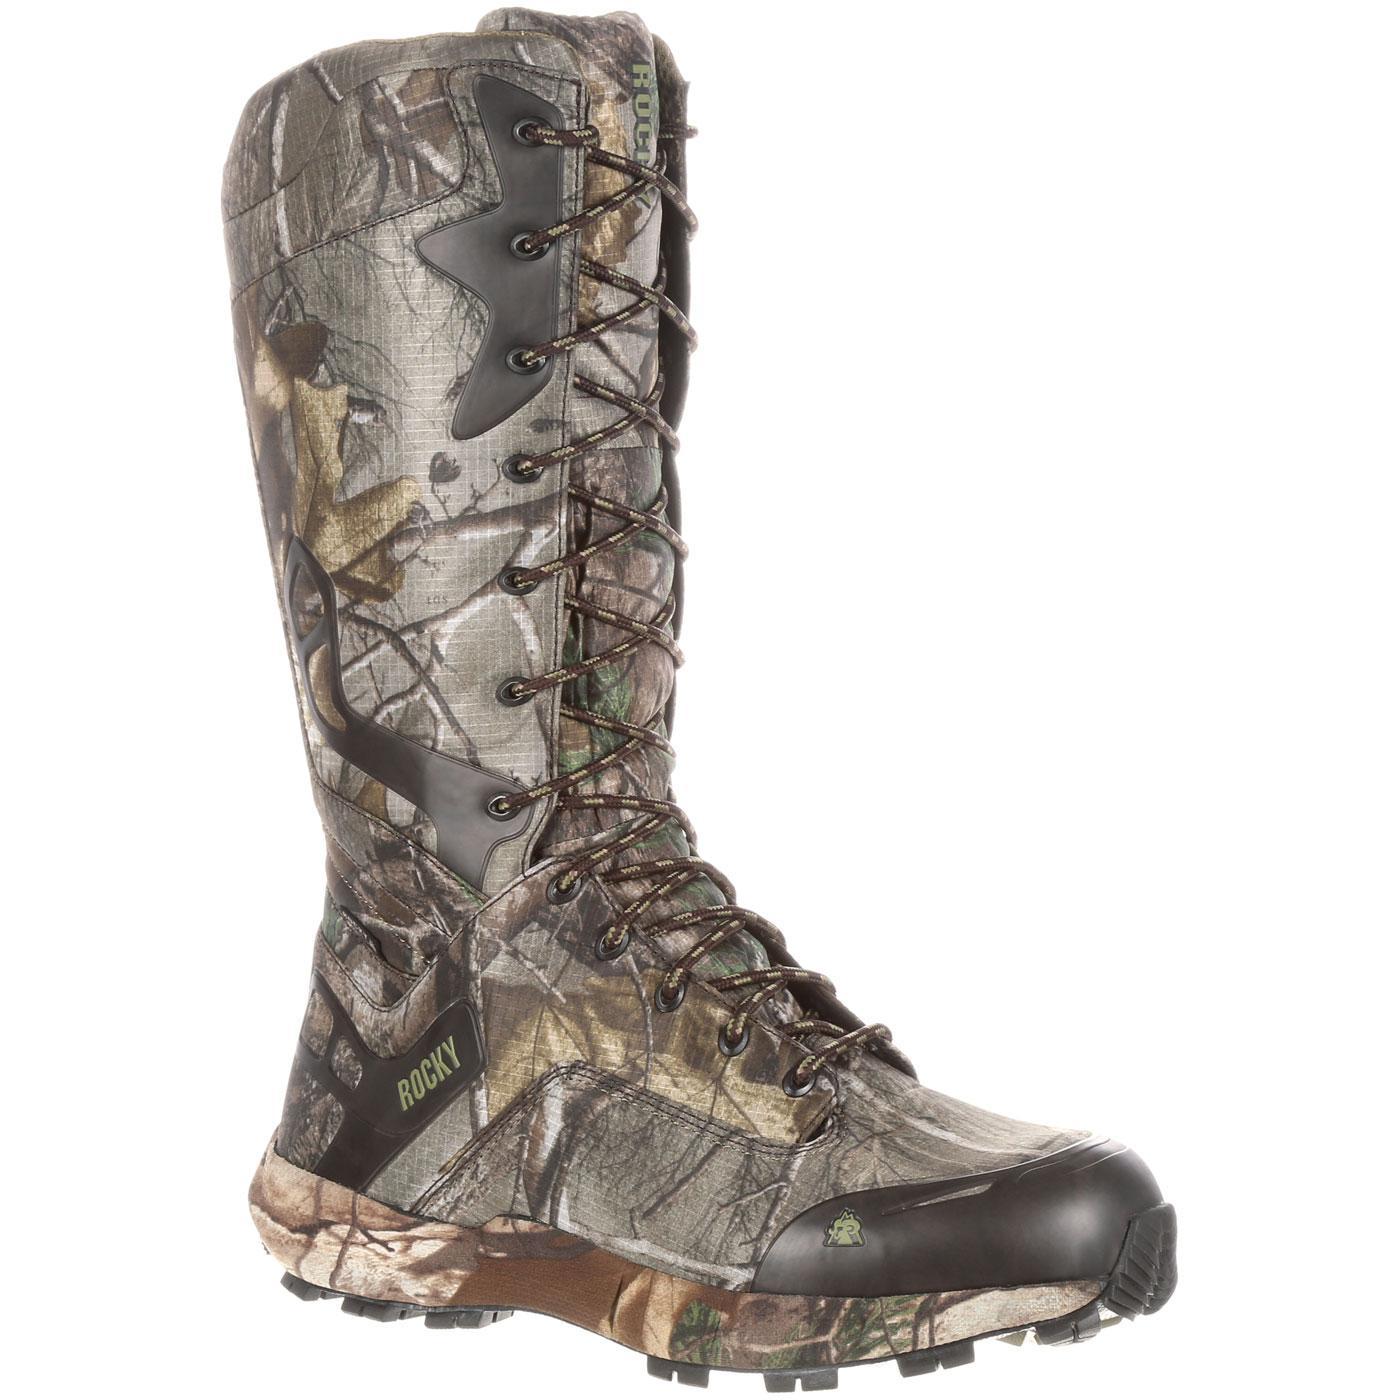 Rocky Broadhead Waterproof Insulated 16 Inch Trail Boot